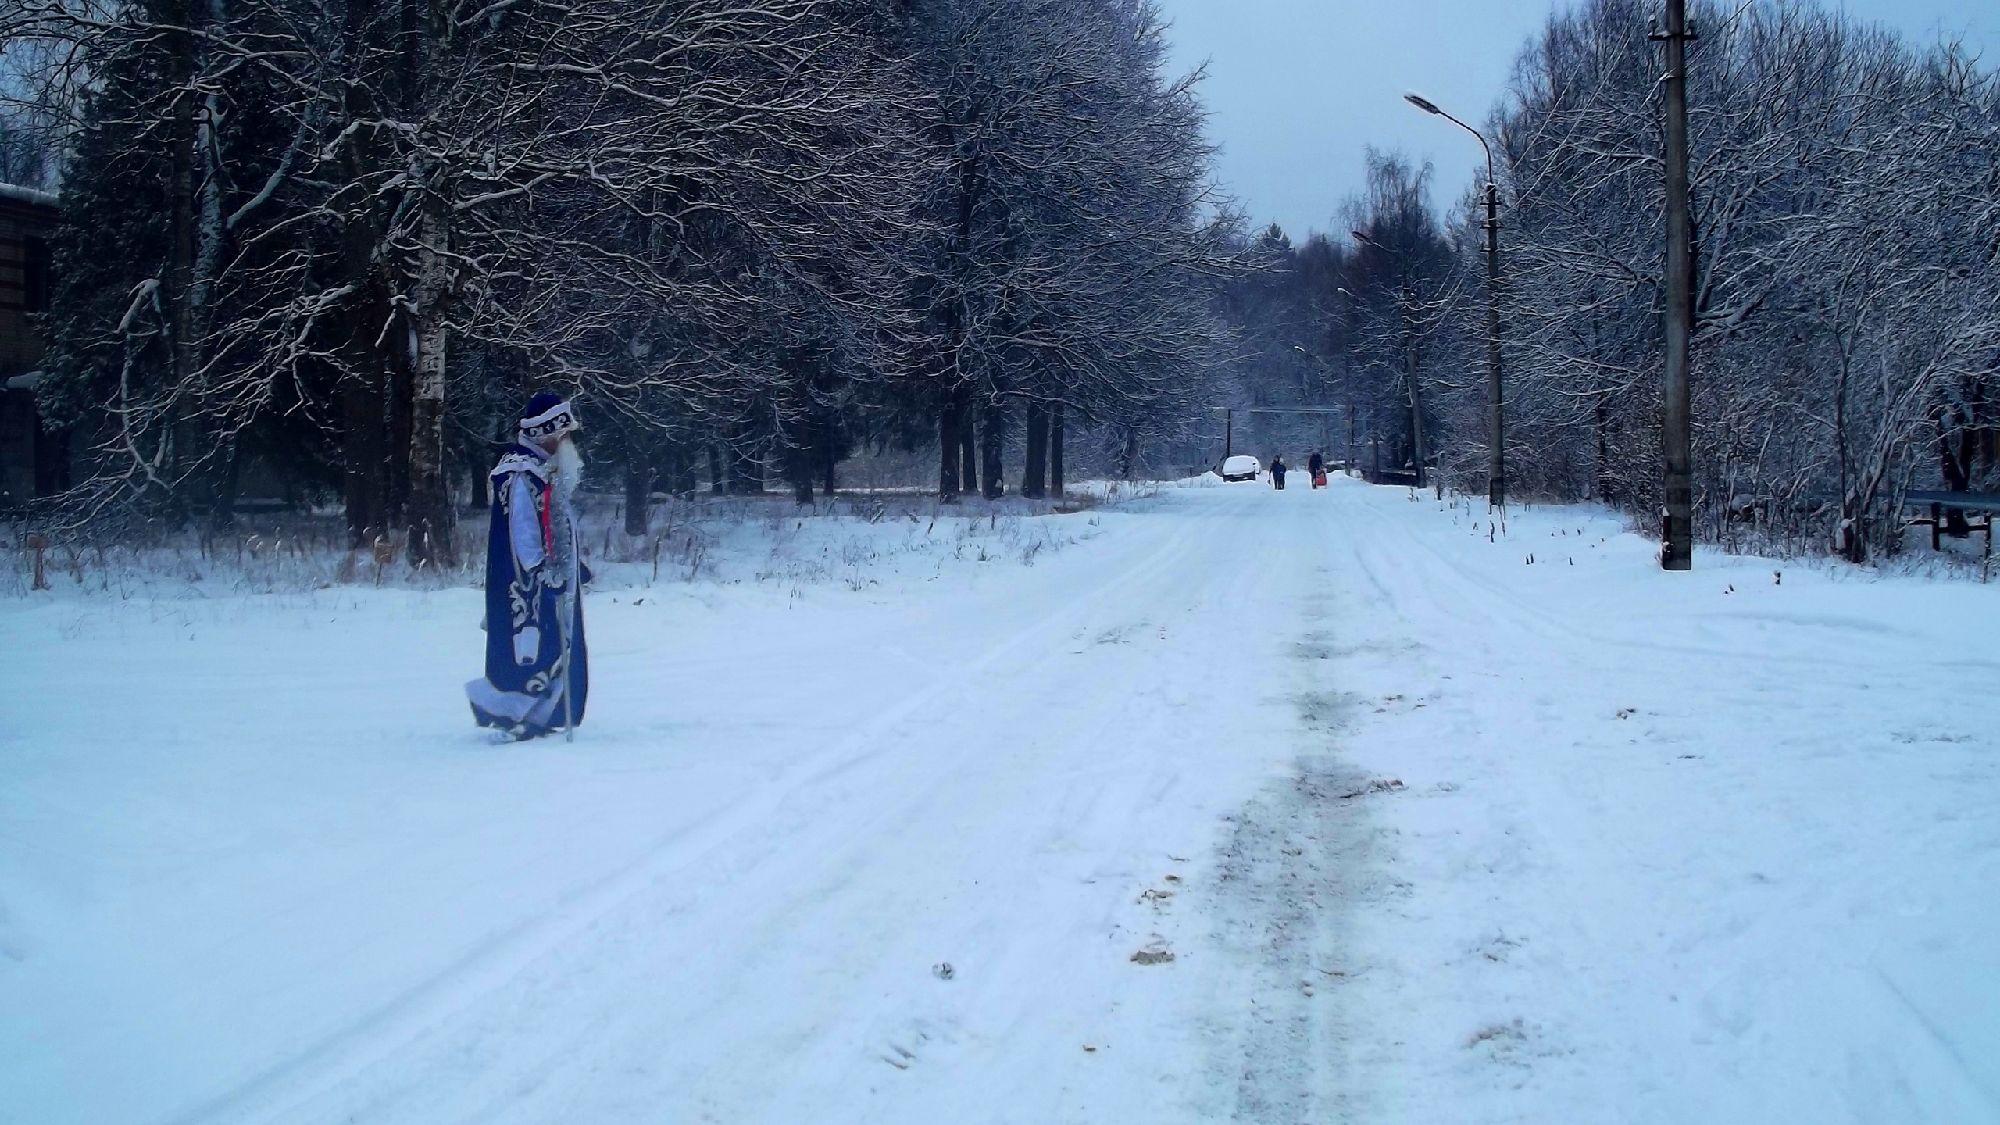 На дорогу внезапно вышел Дед мороз.